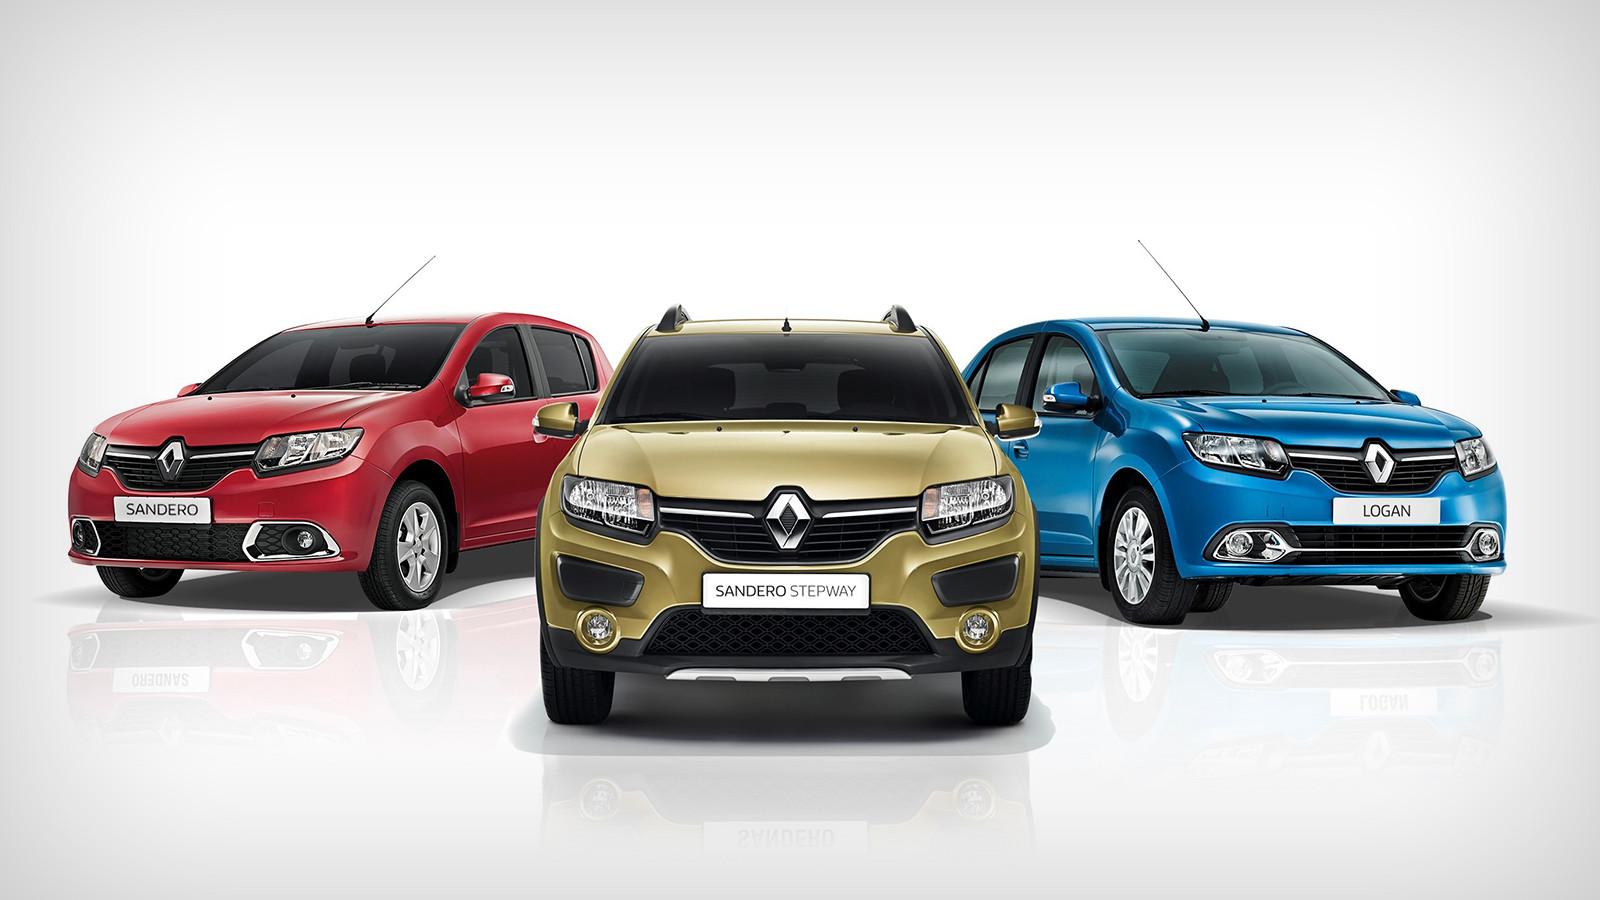 Рено реализовала на русском рынке 1,5 млн авто